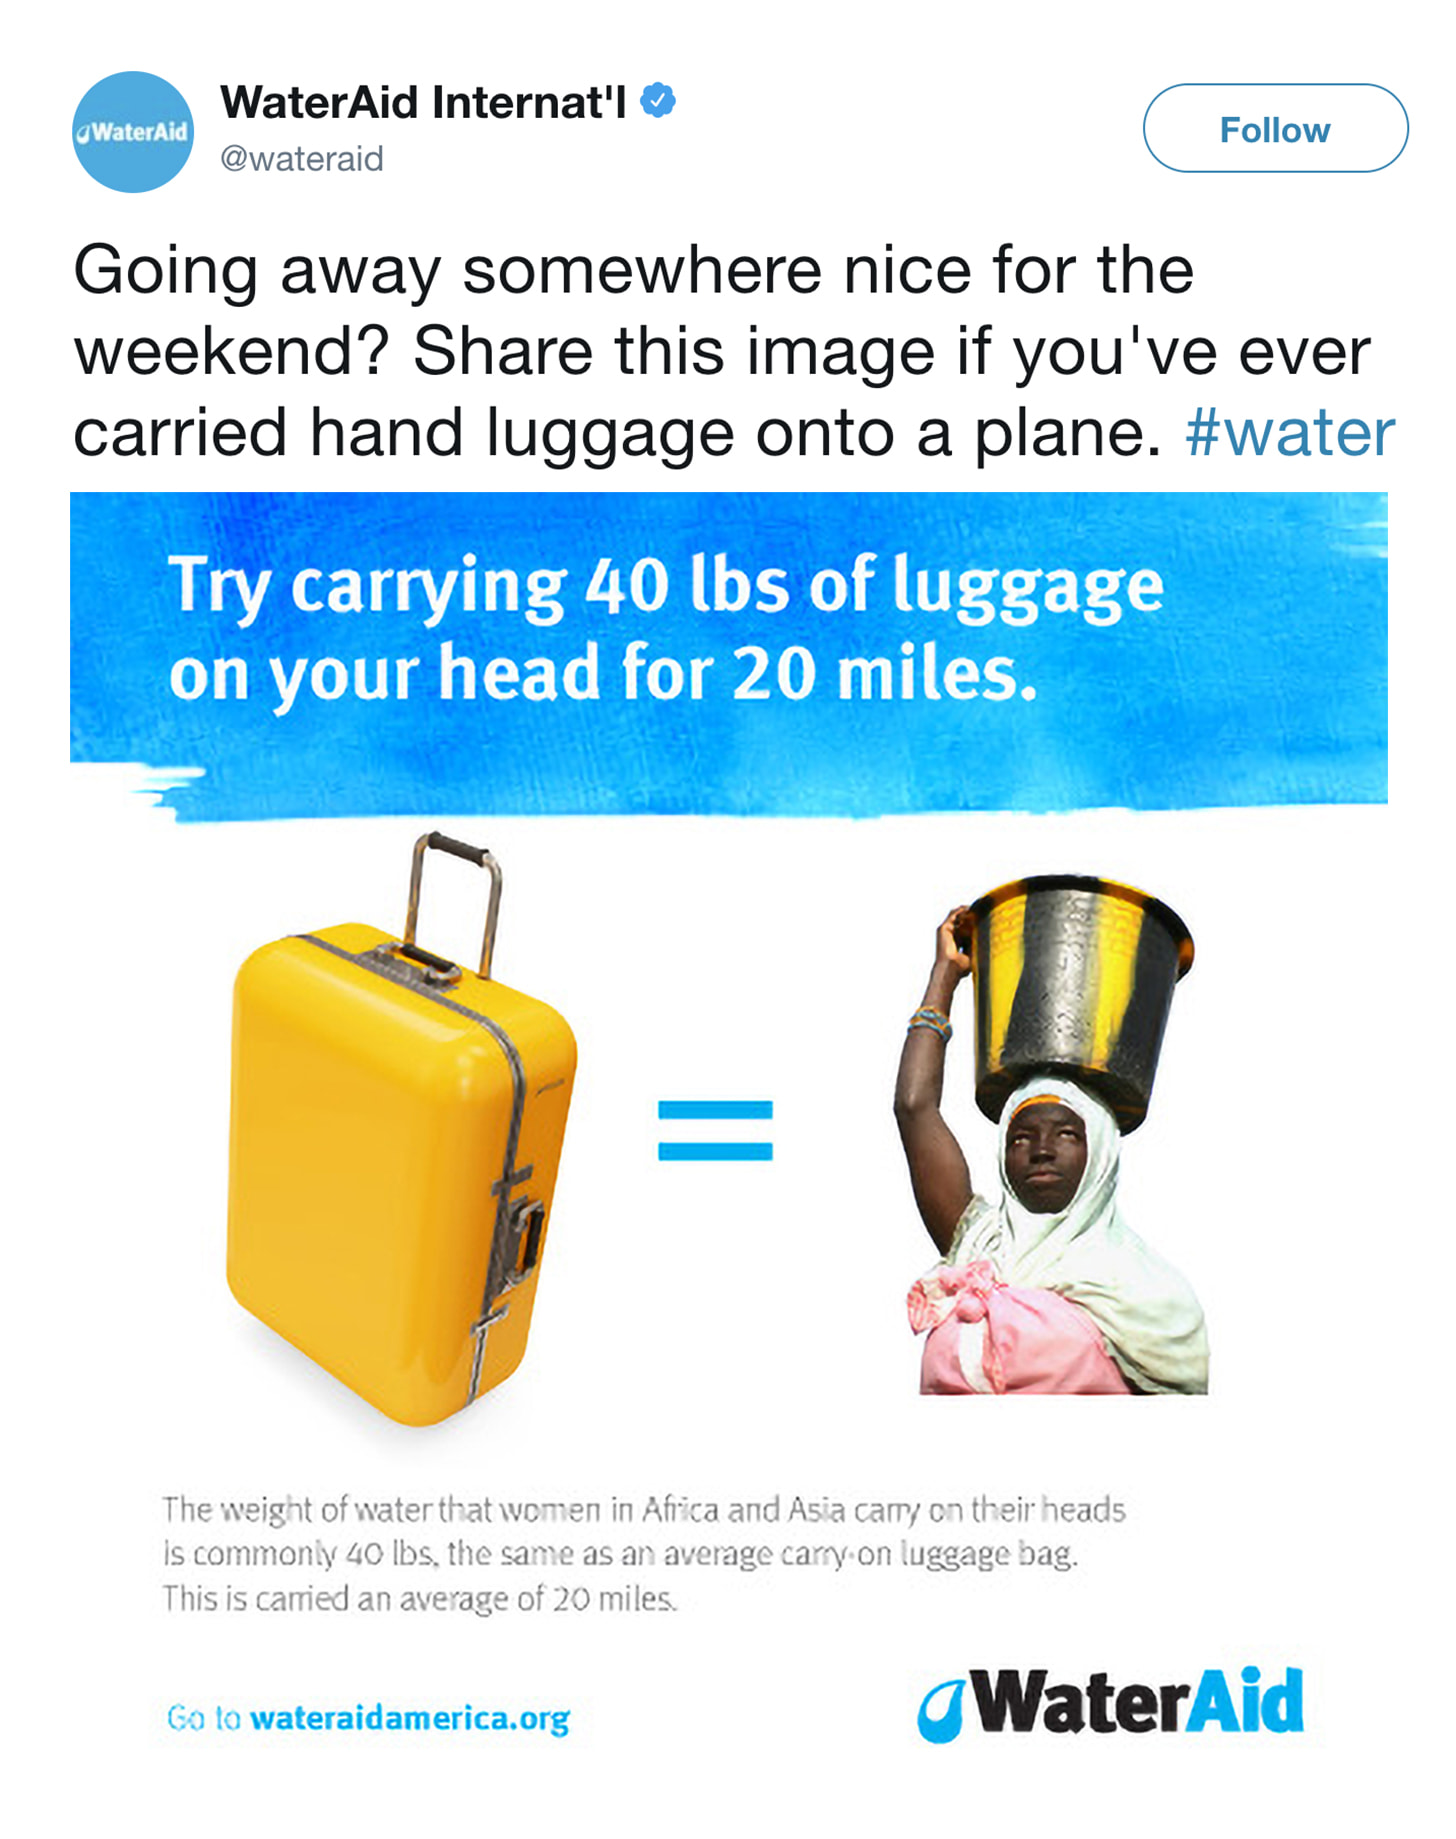 WaterAid Twitter post